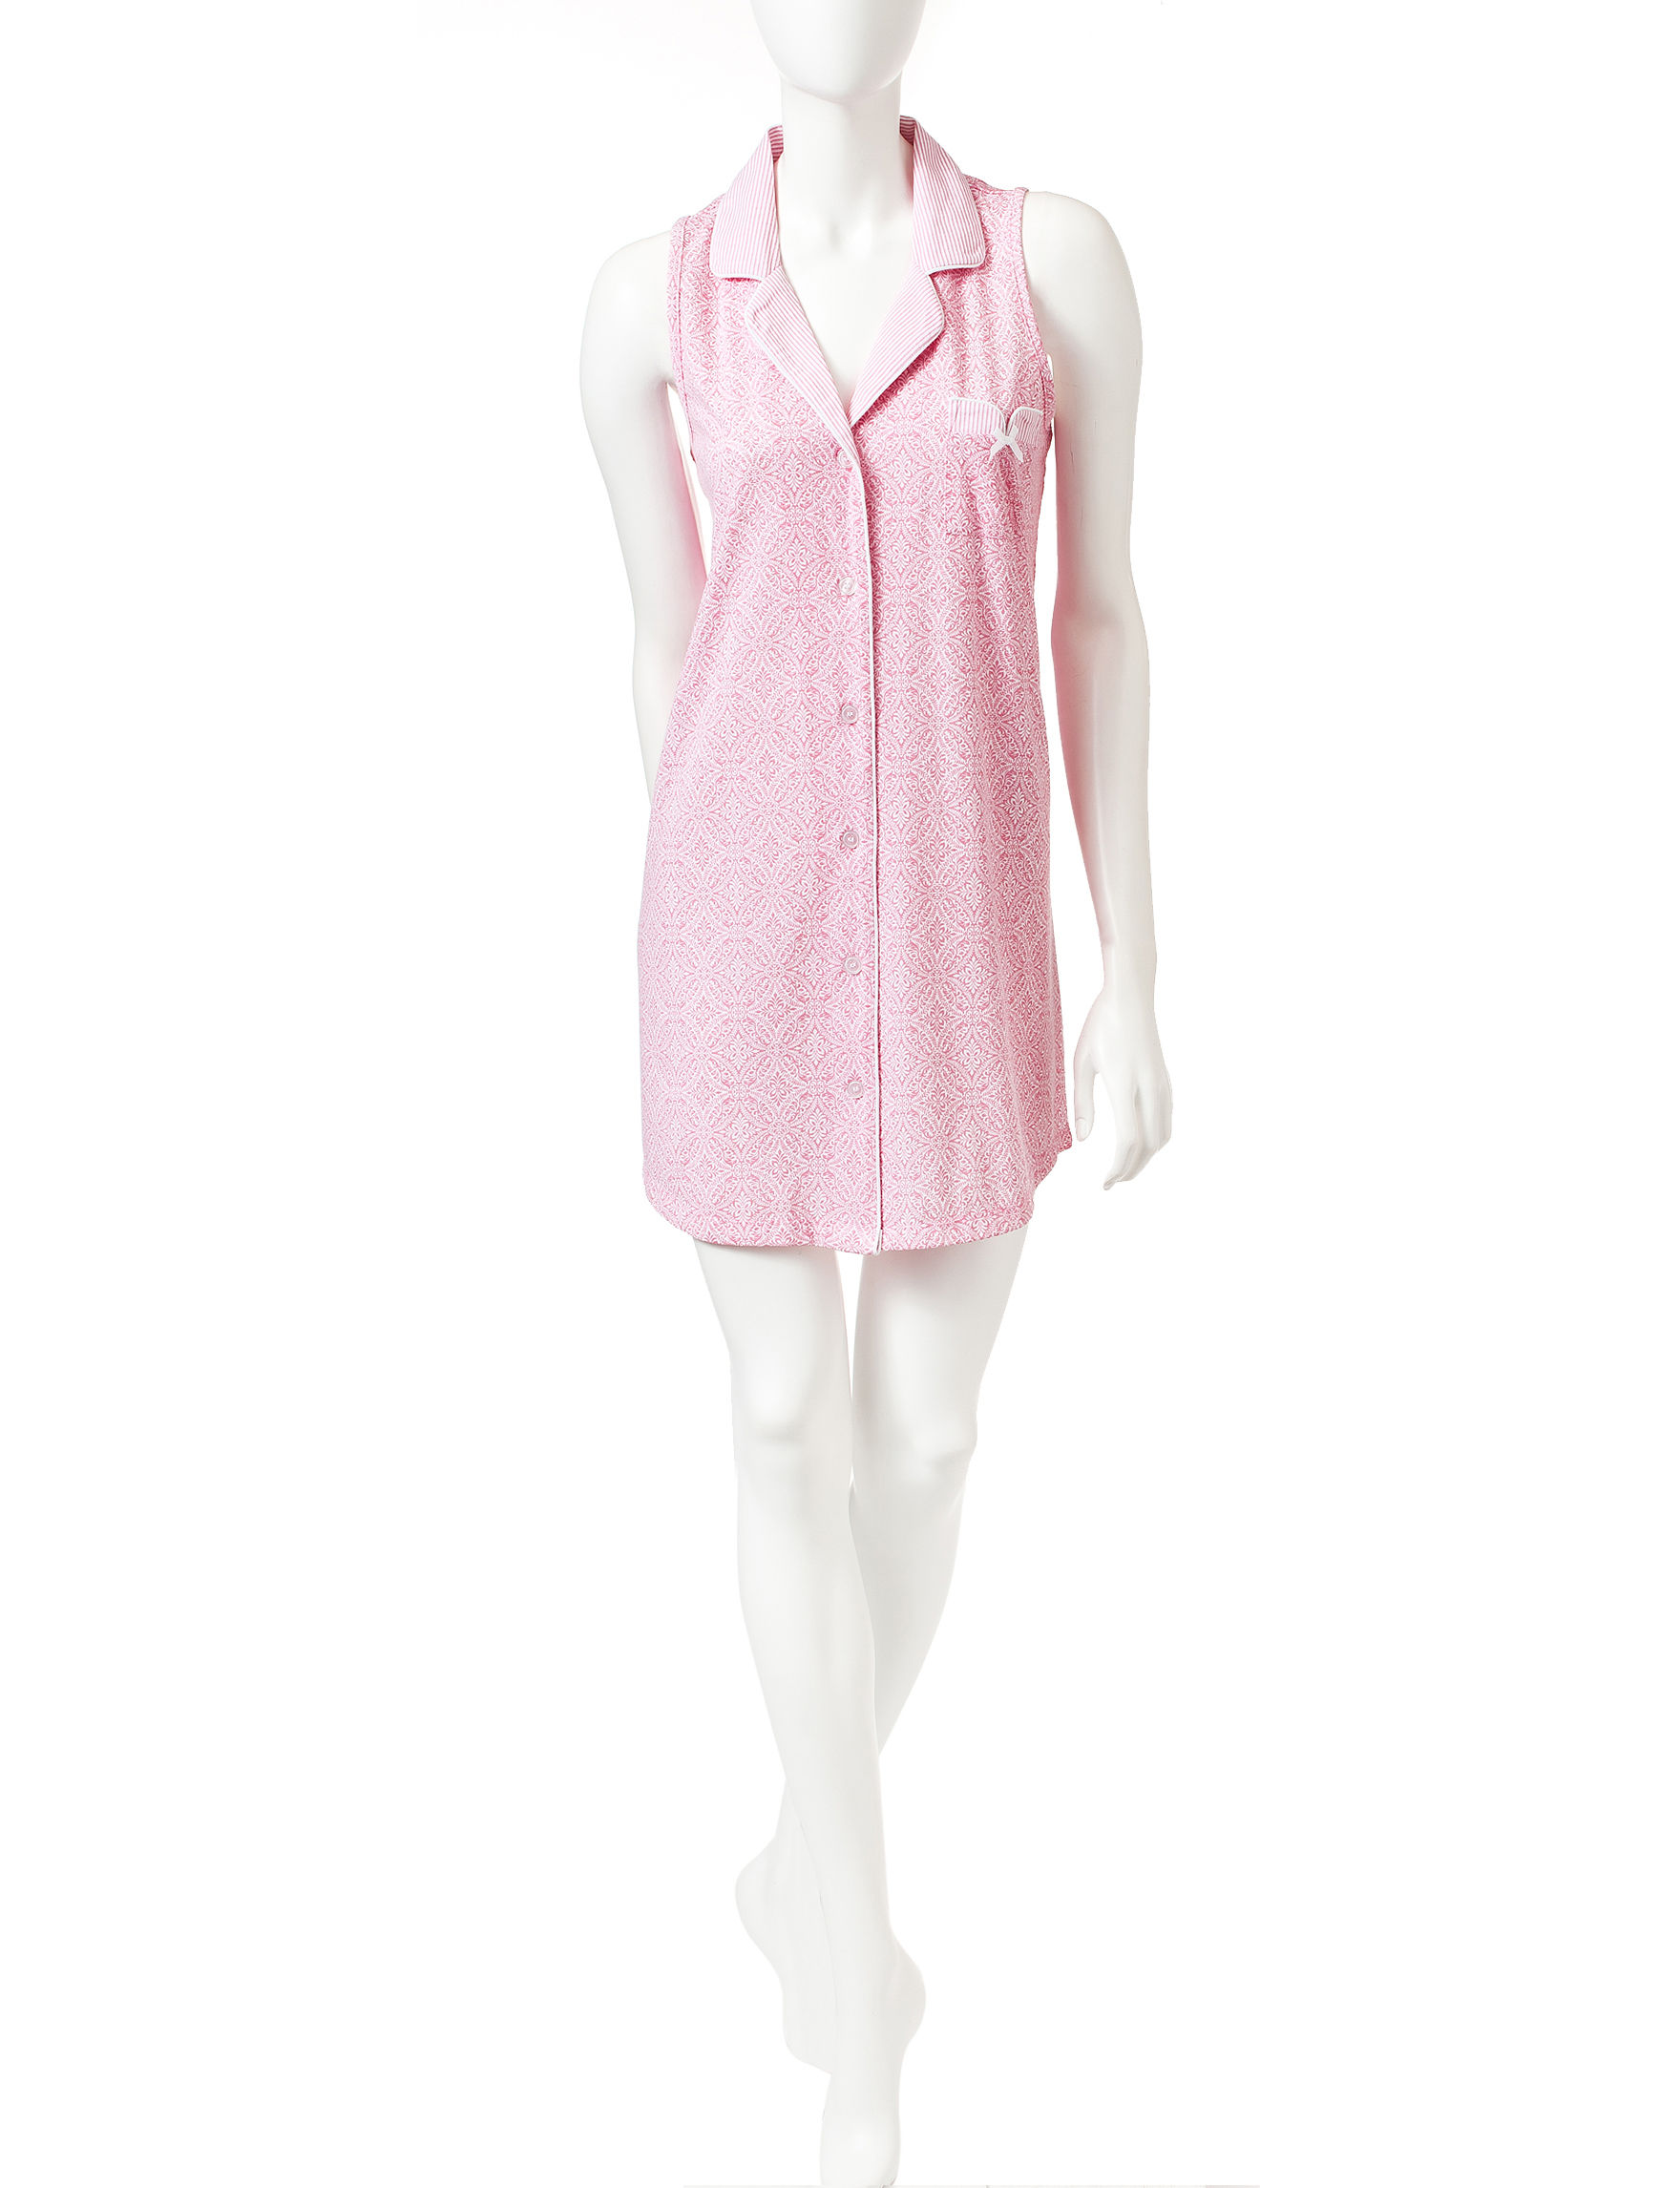 Laura Ashley Pink Multi Nightgowns & Sleep Shirts